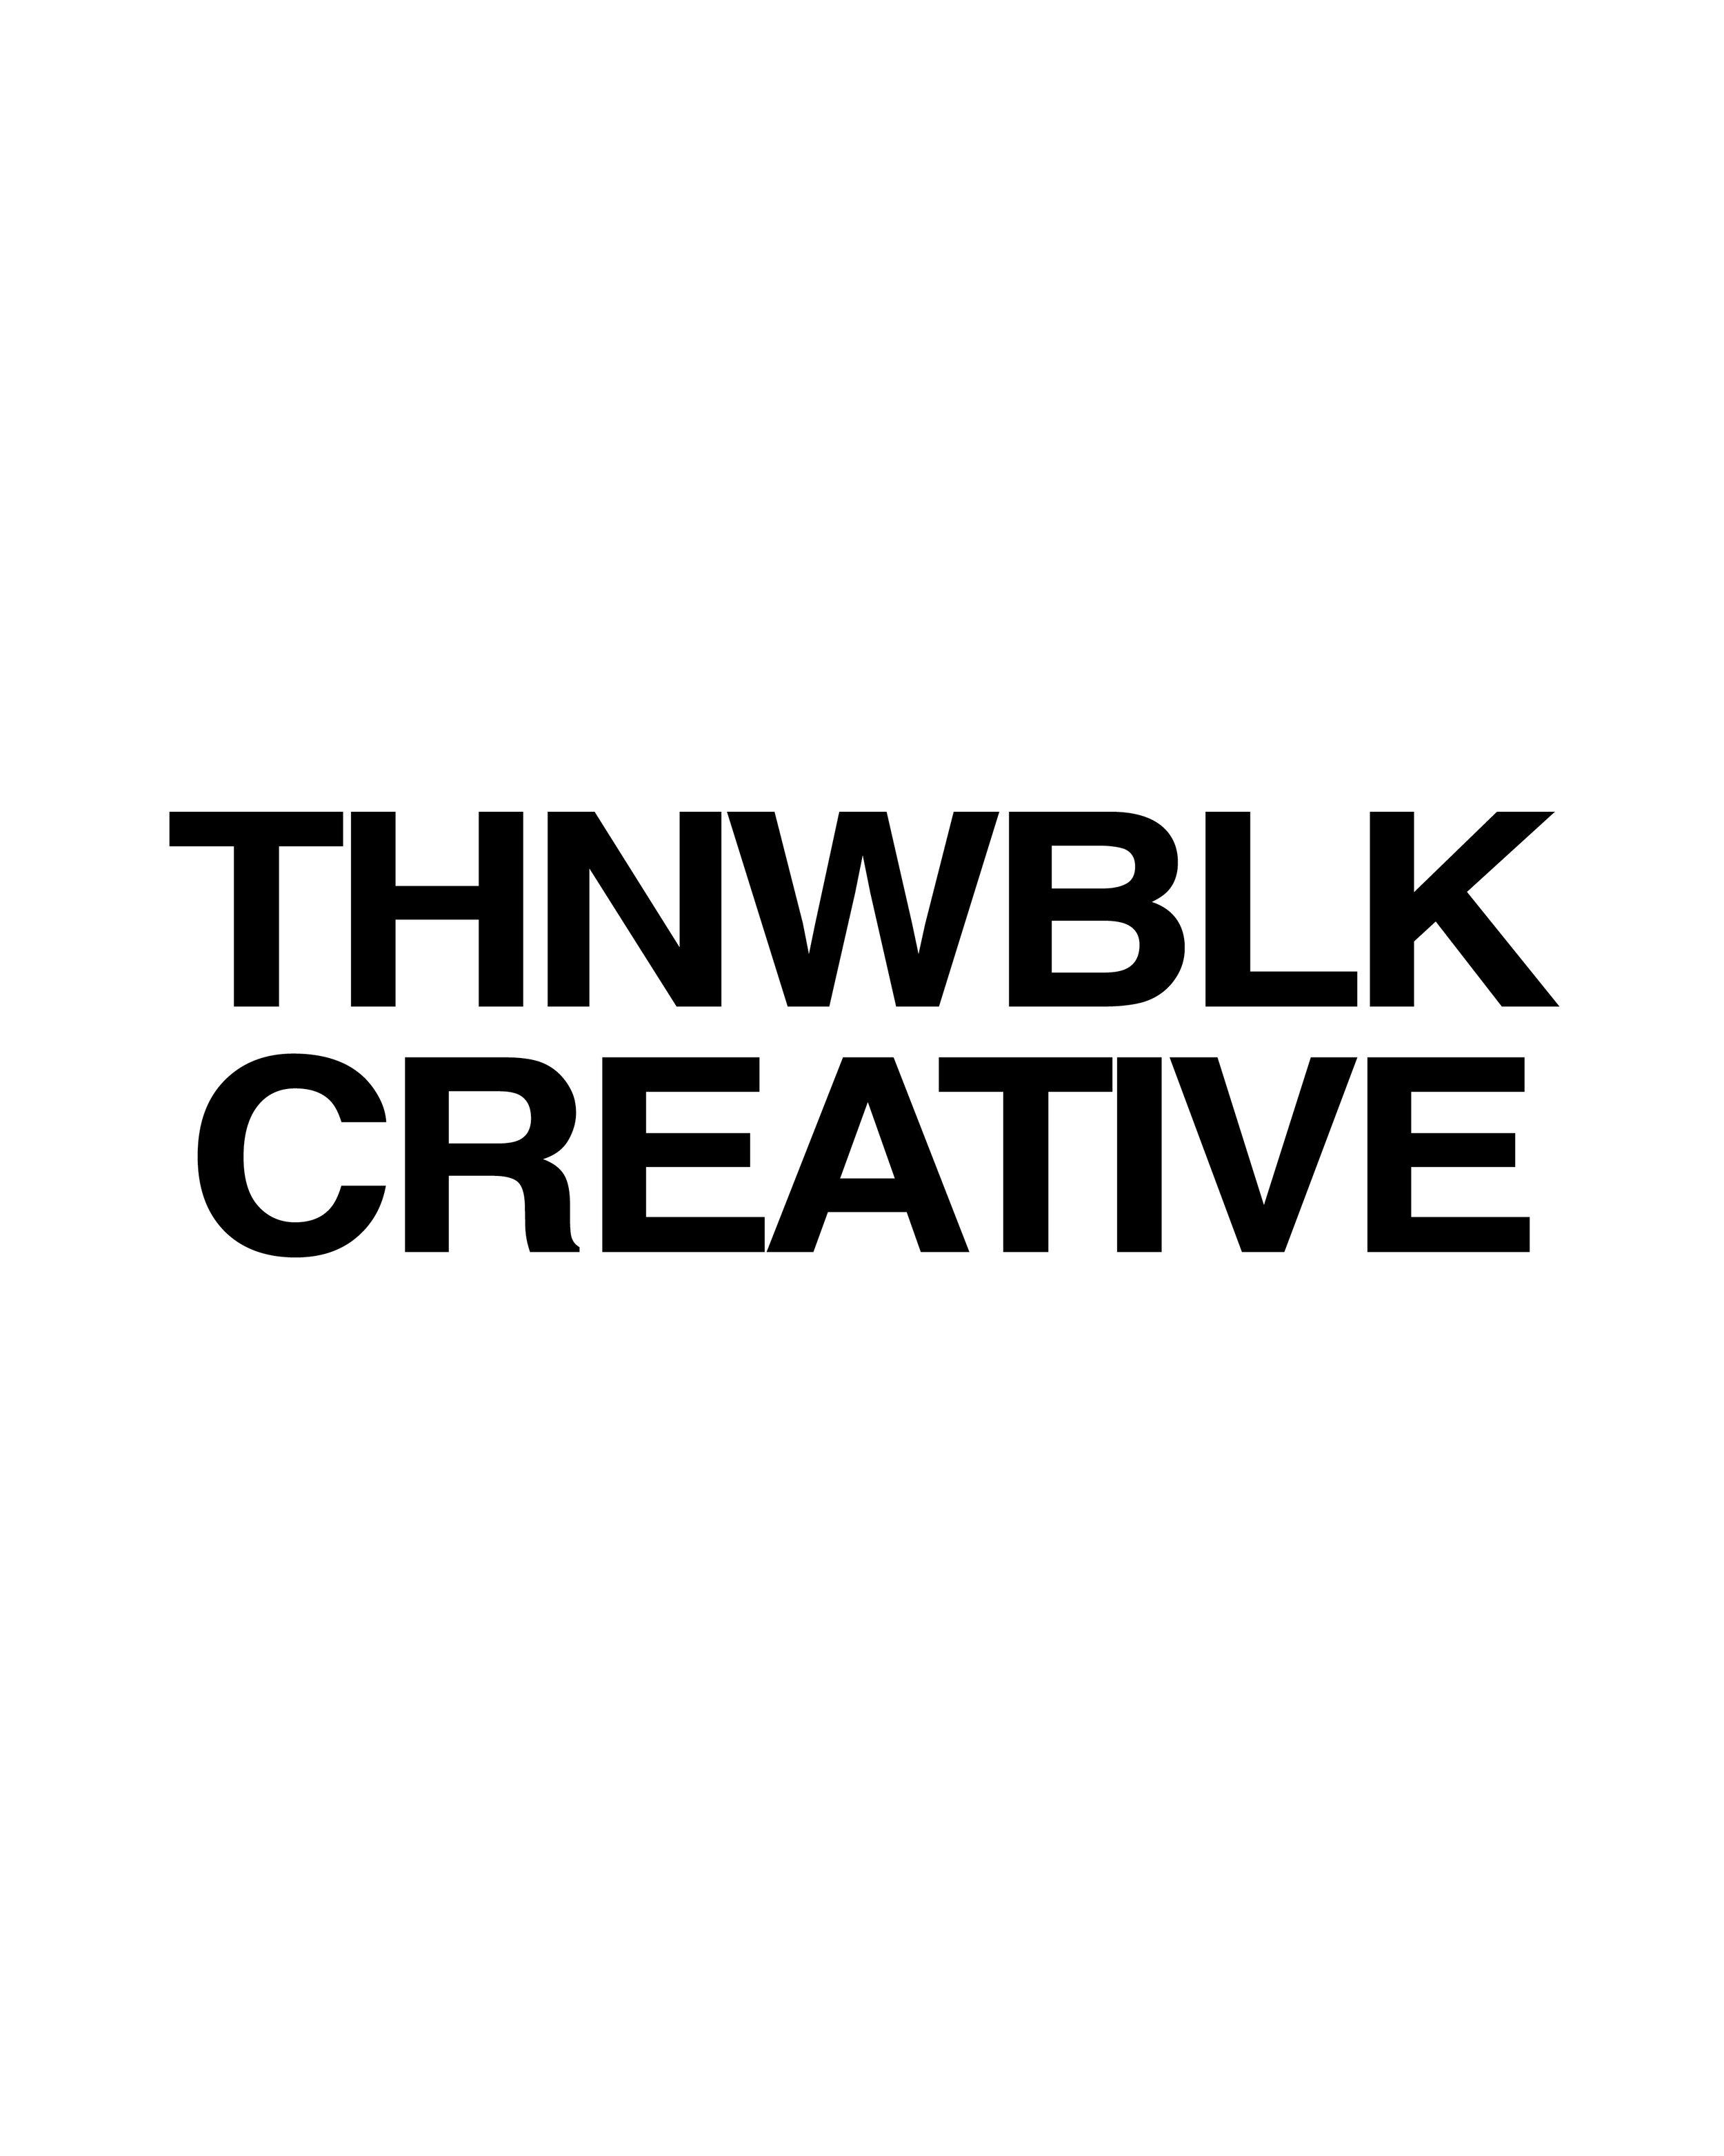 TNB CREATIVE.jpg